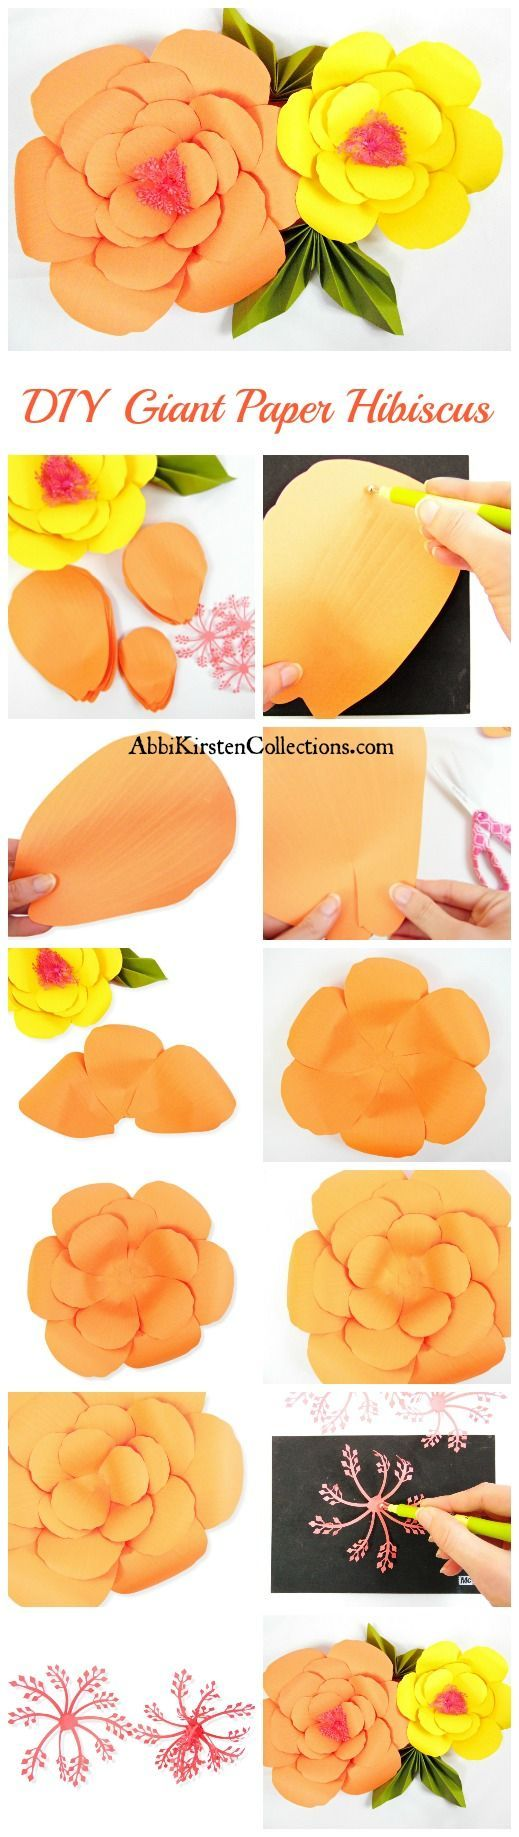 Summertime Giant Hibiscus Paper Flowers Free Printable Flower